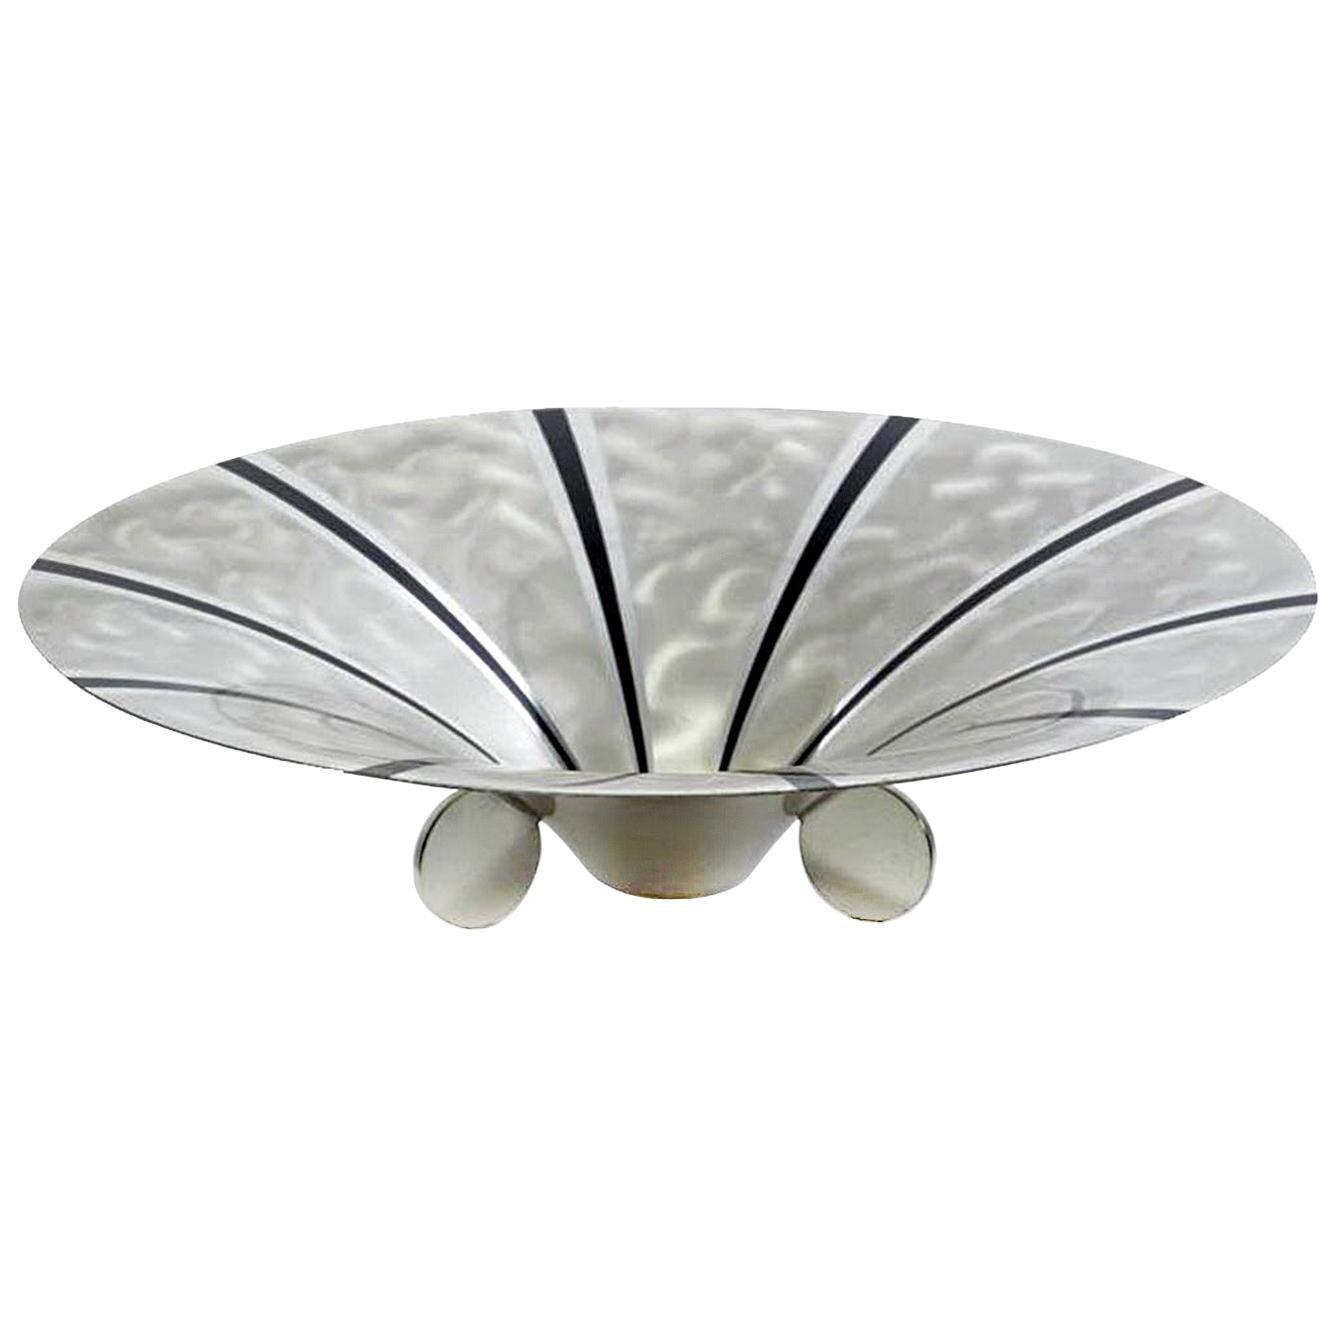 Art Deco Large WMF Ikora Silver Plated Bowl Center Piece